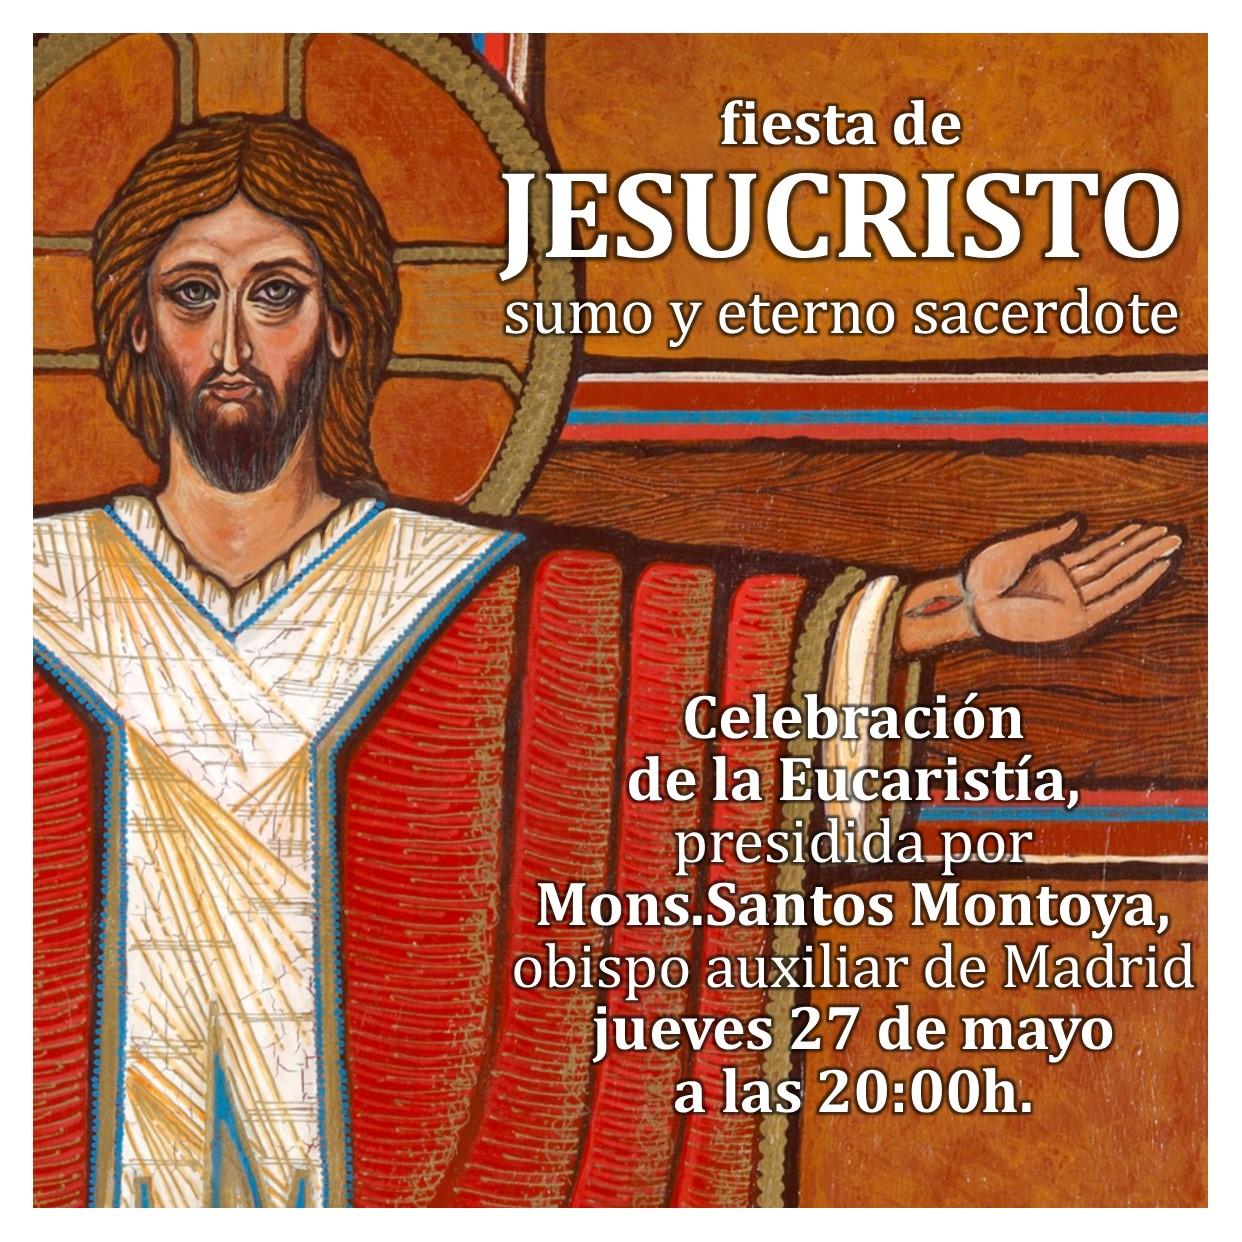 Fiesta de Cristo Sacerdote